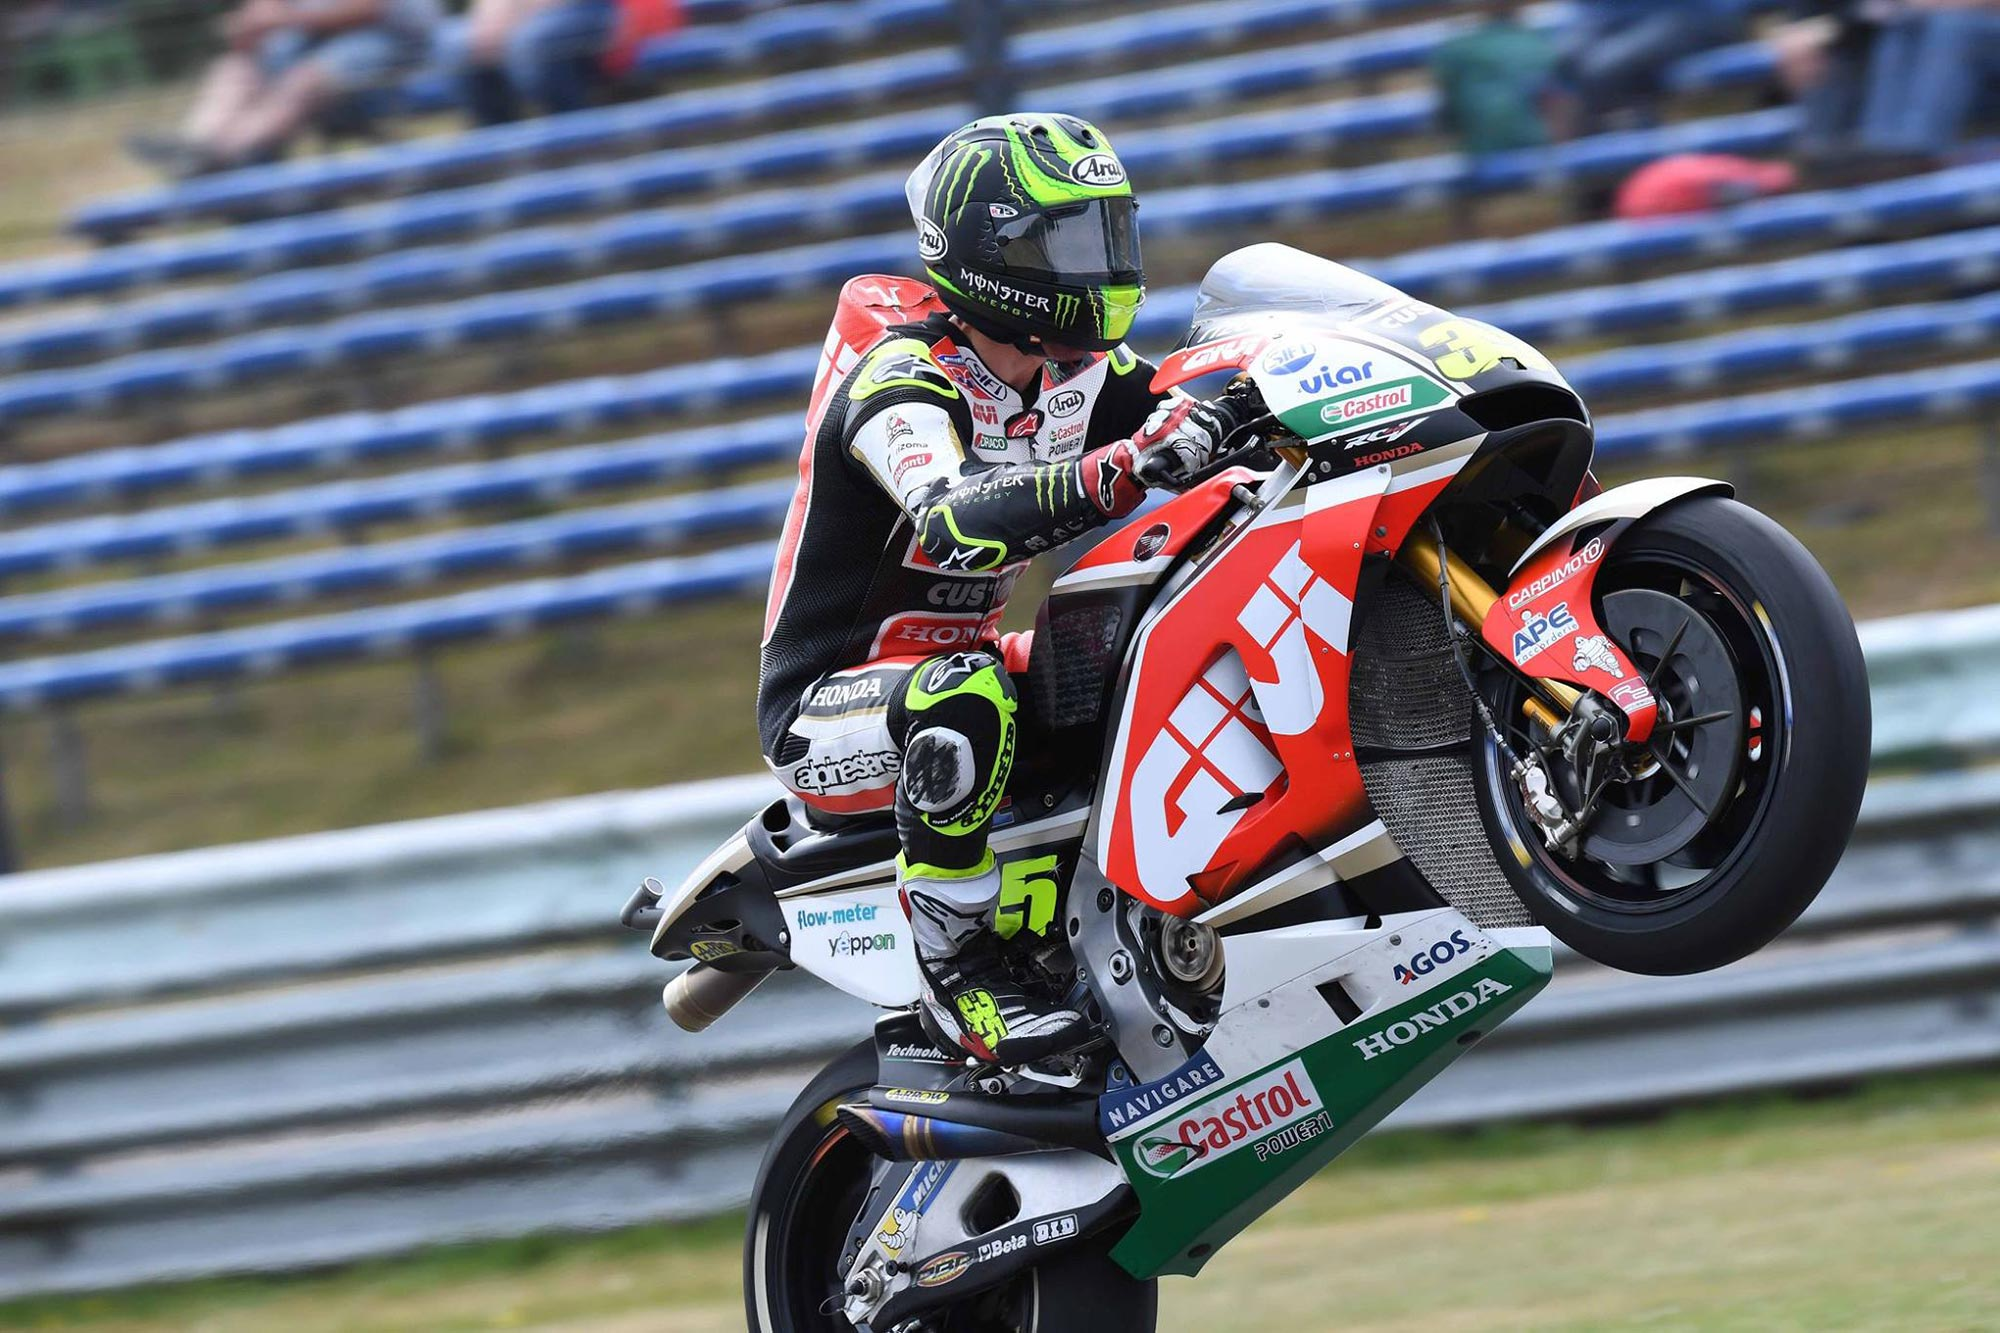 Friday MotoGP Summary at Assen: Fast Yamahas, Unstable Bikes, & Aerodynamic Loopholes